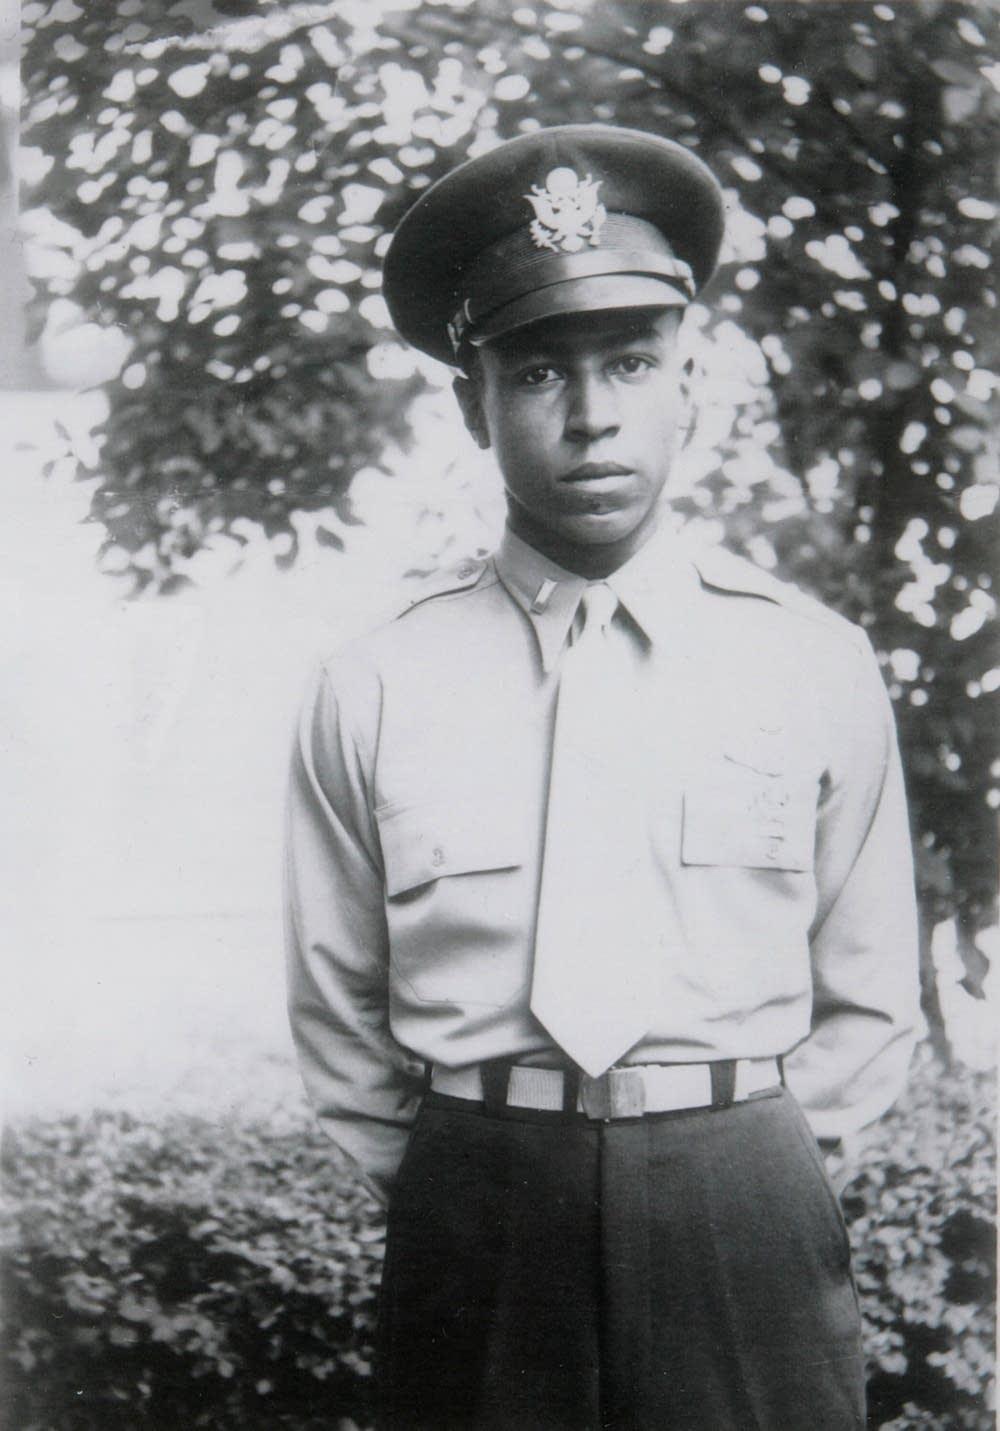 Joe Gomer in 1942